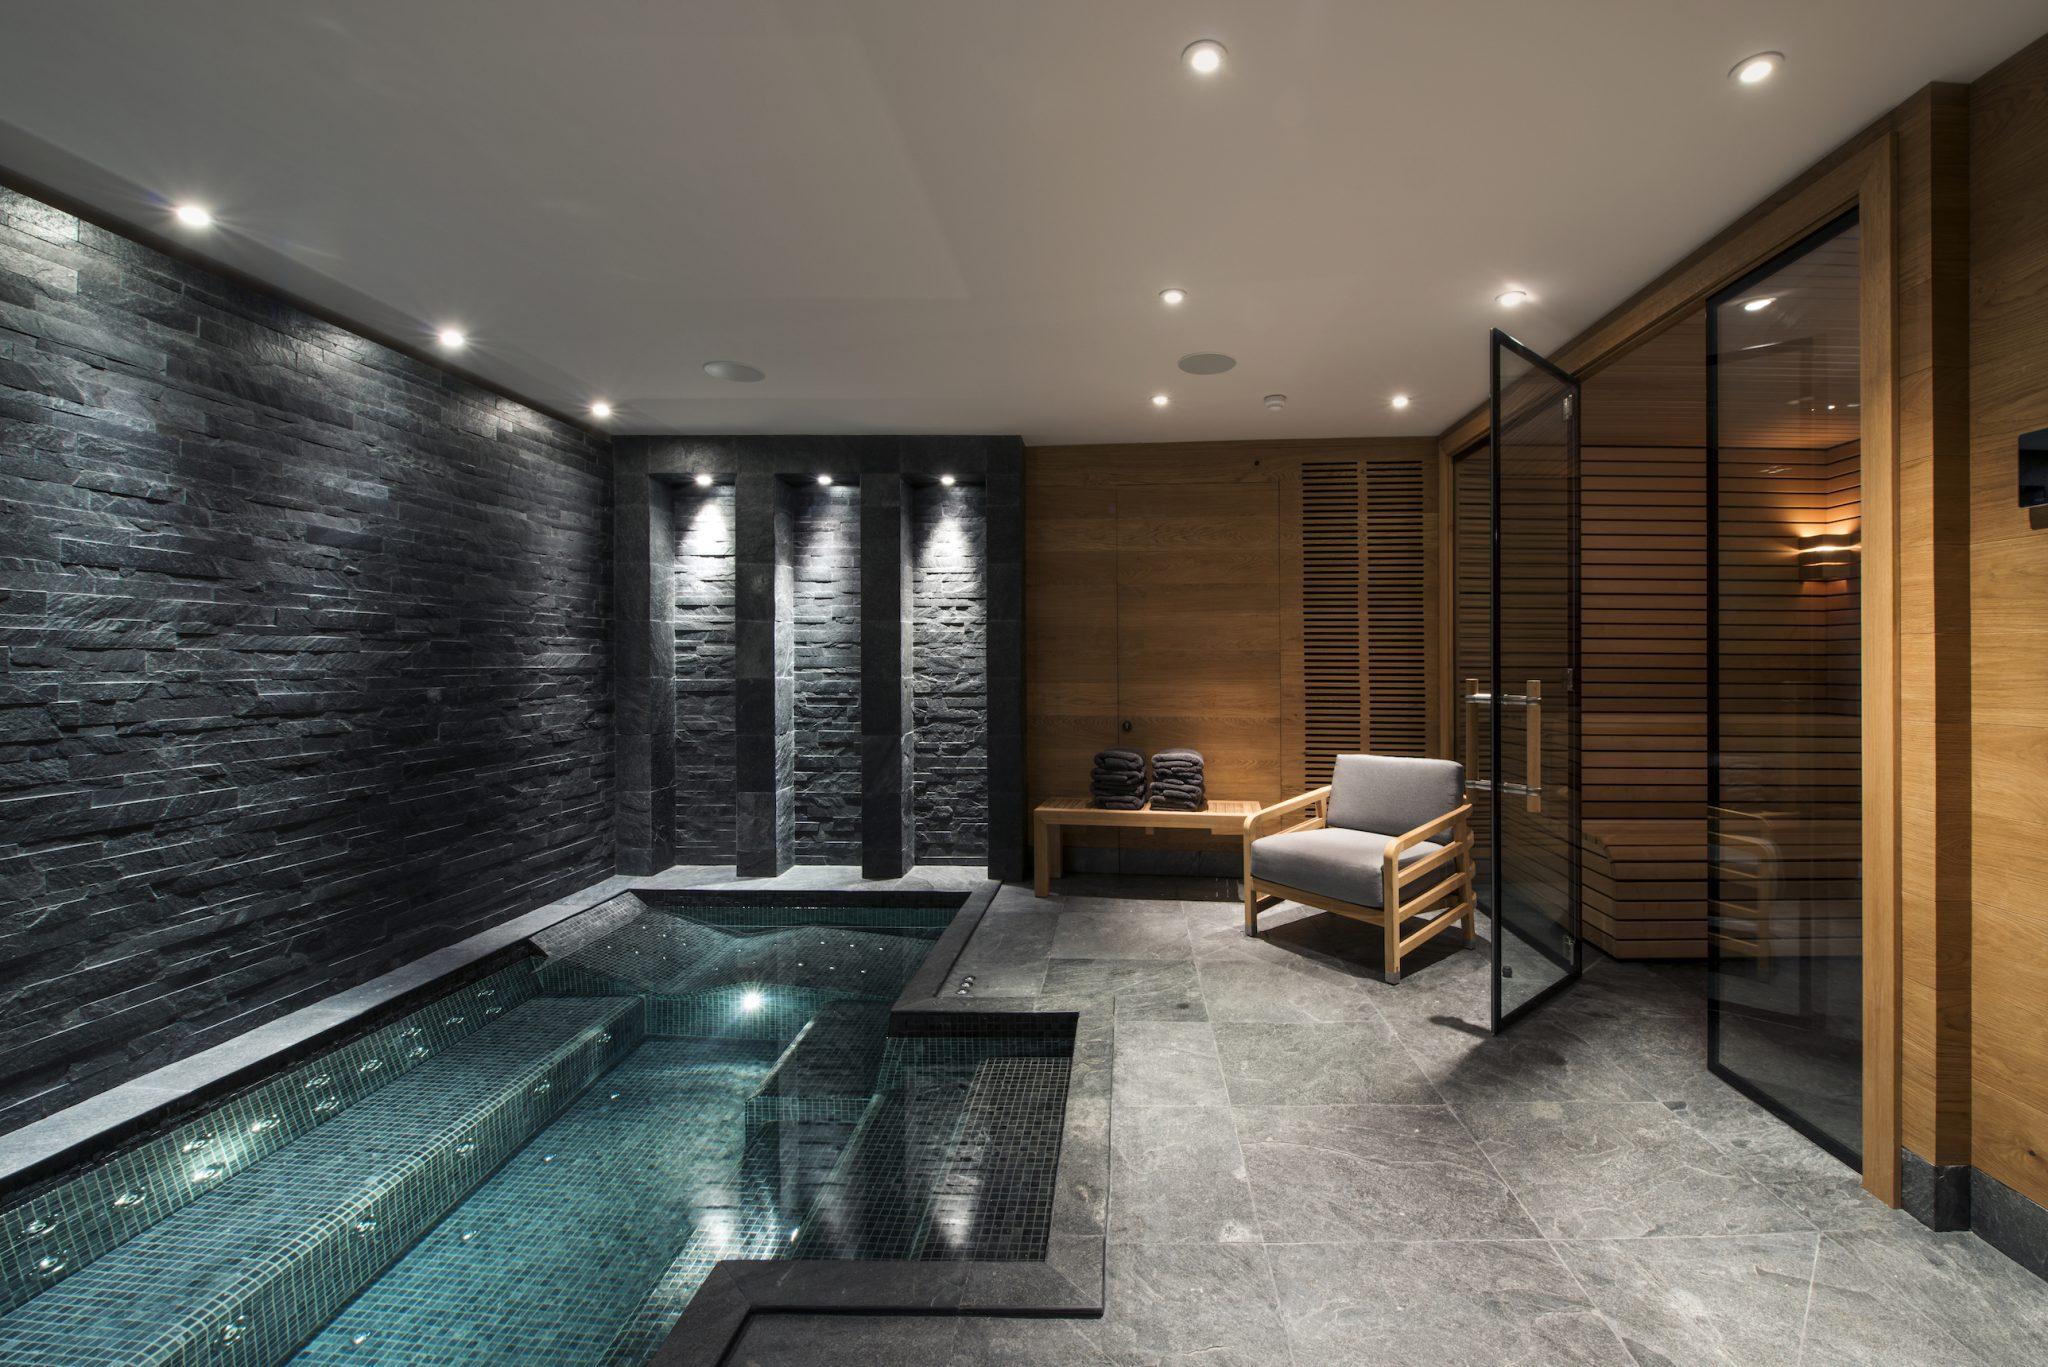 22-spa-swimming-pool-2